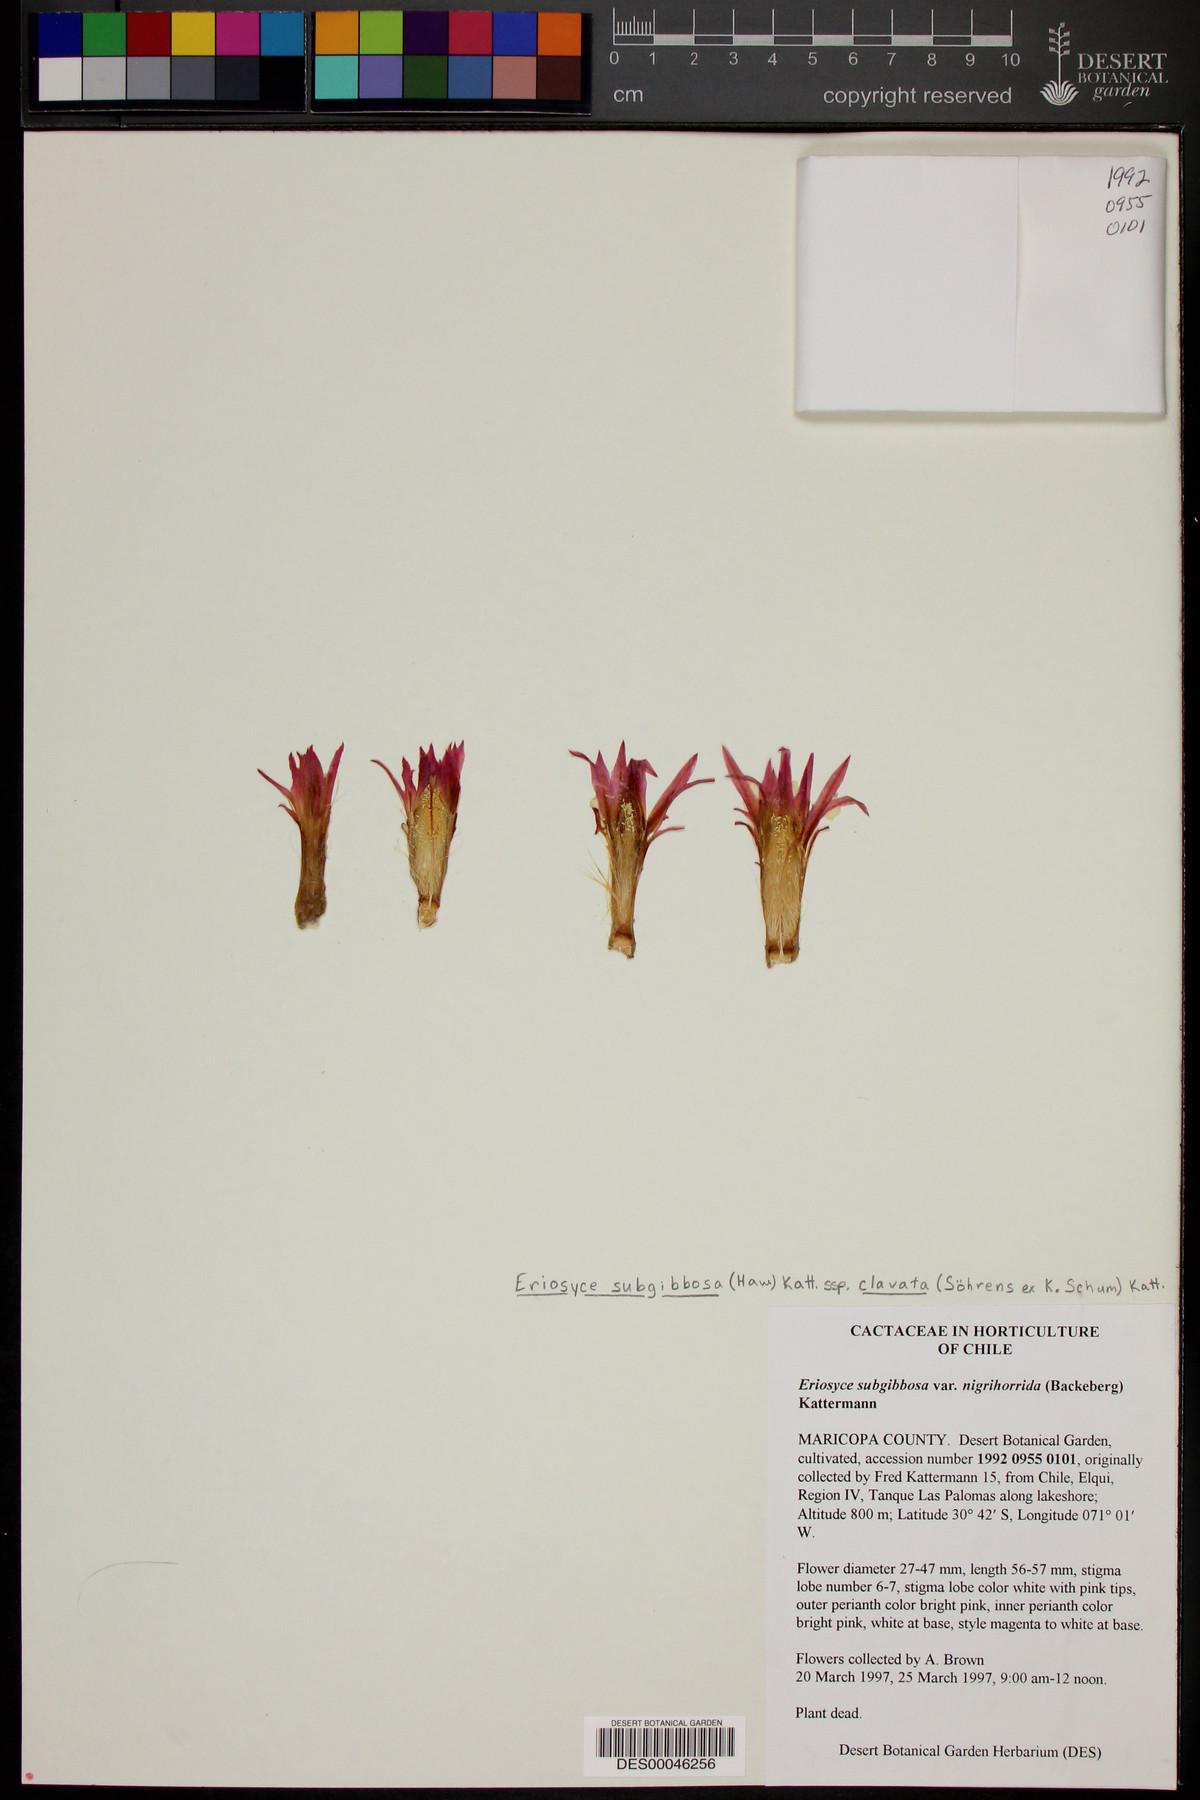 Eriosyce subgibbosa var. nigrihorrida image